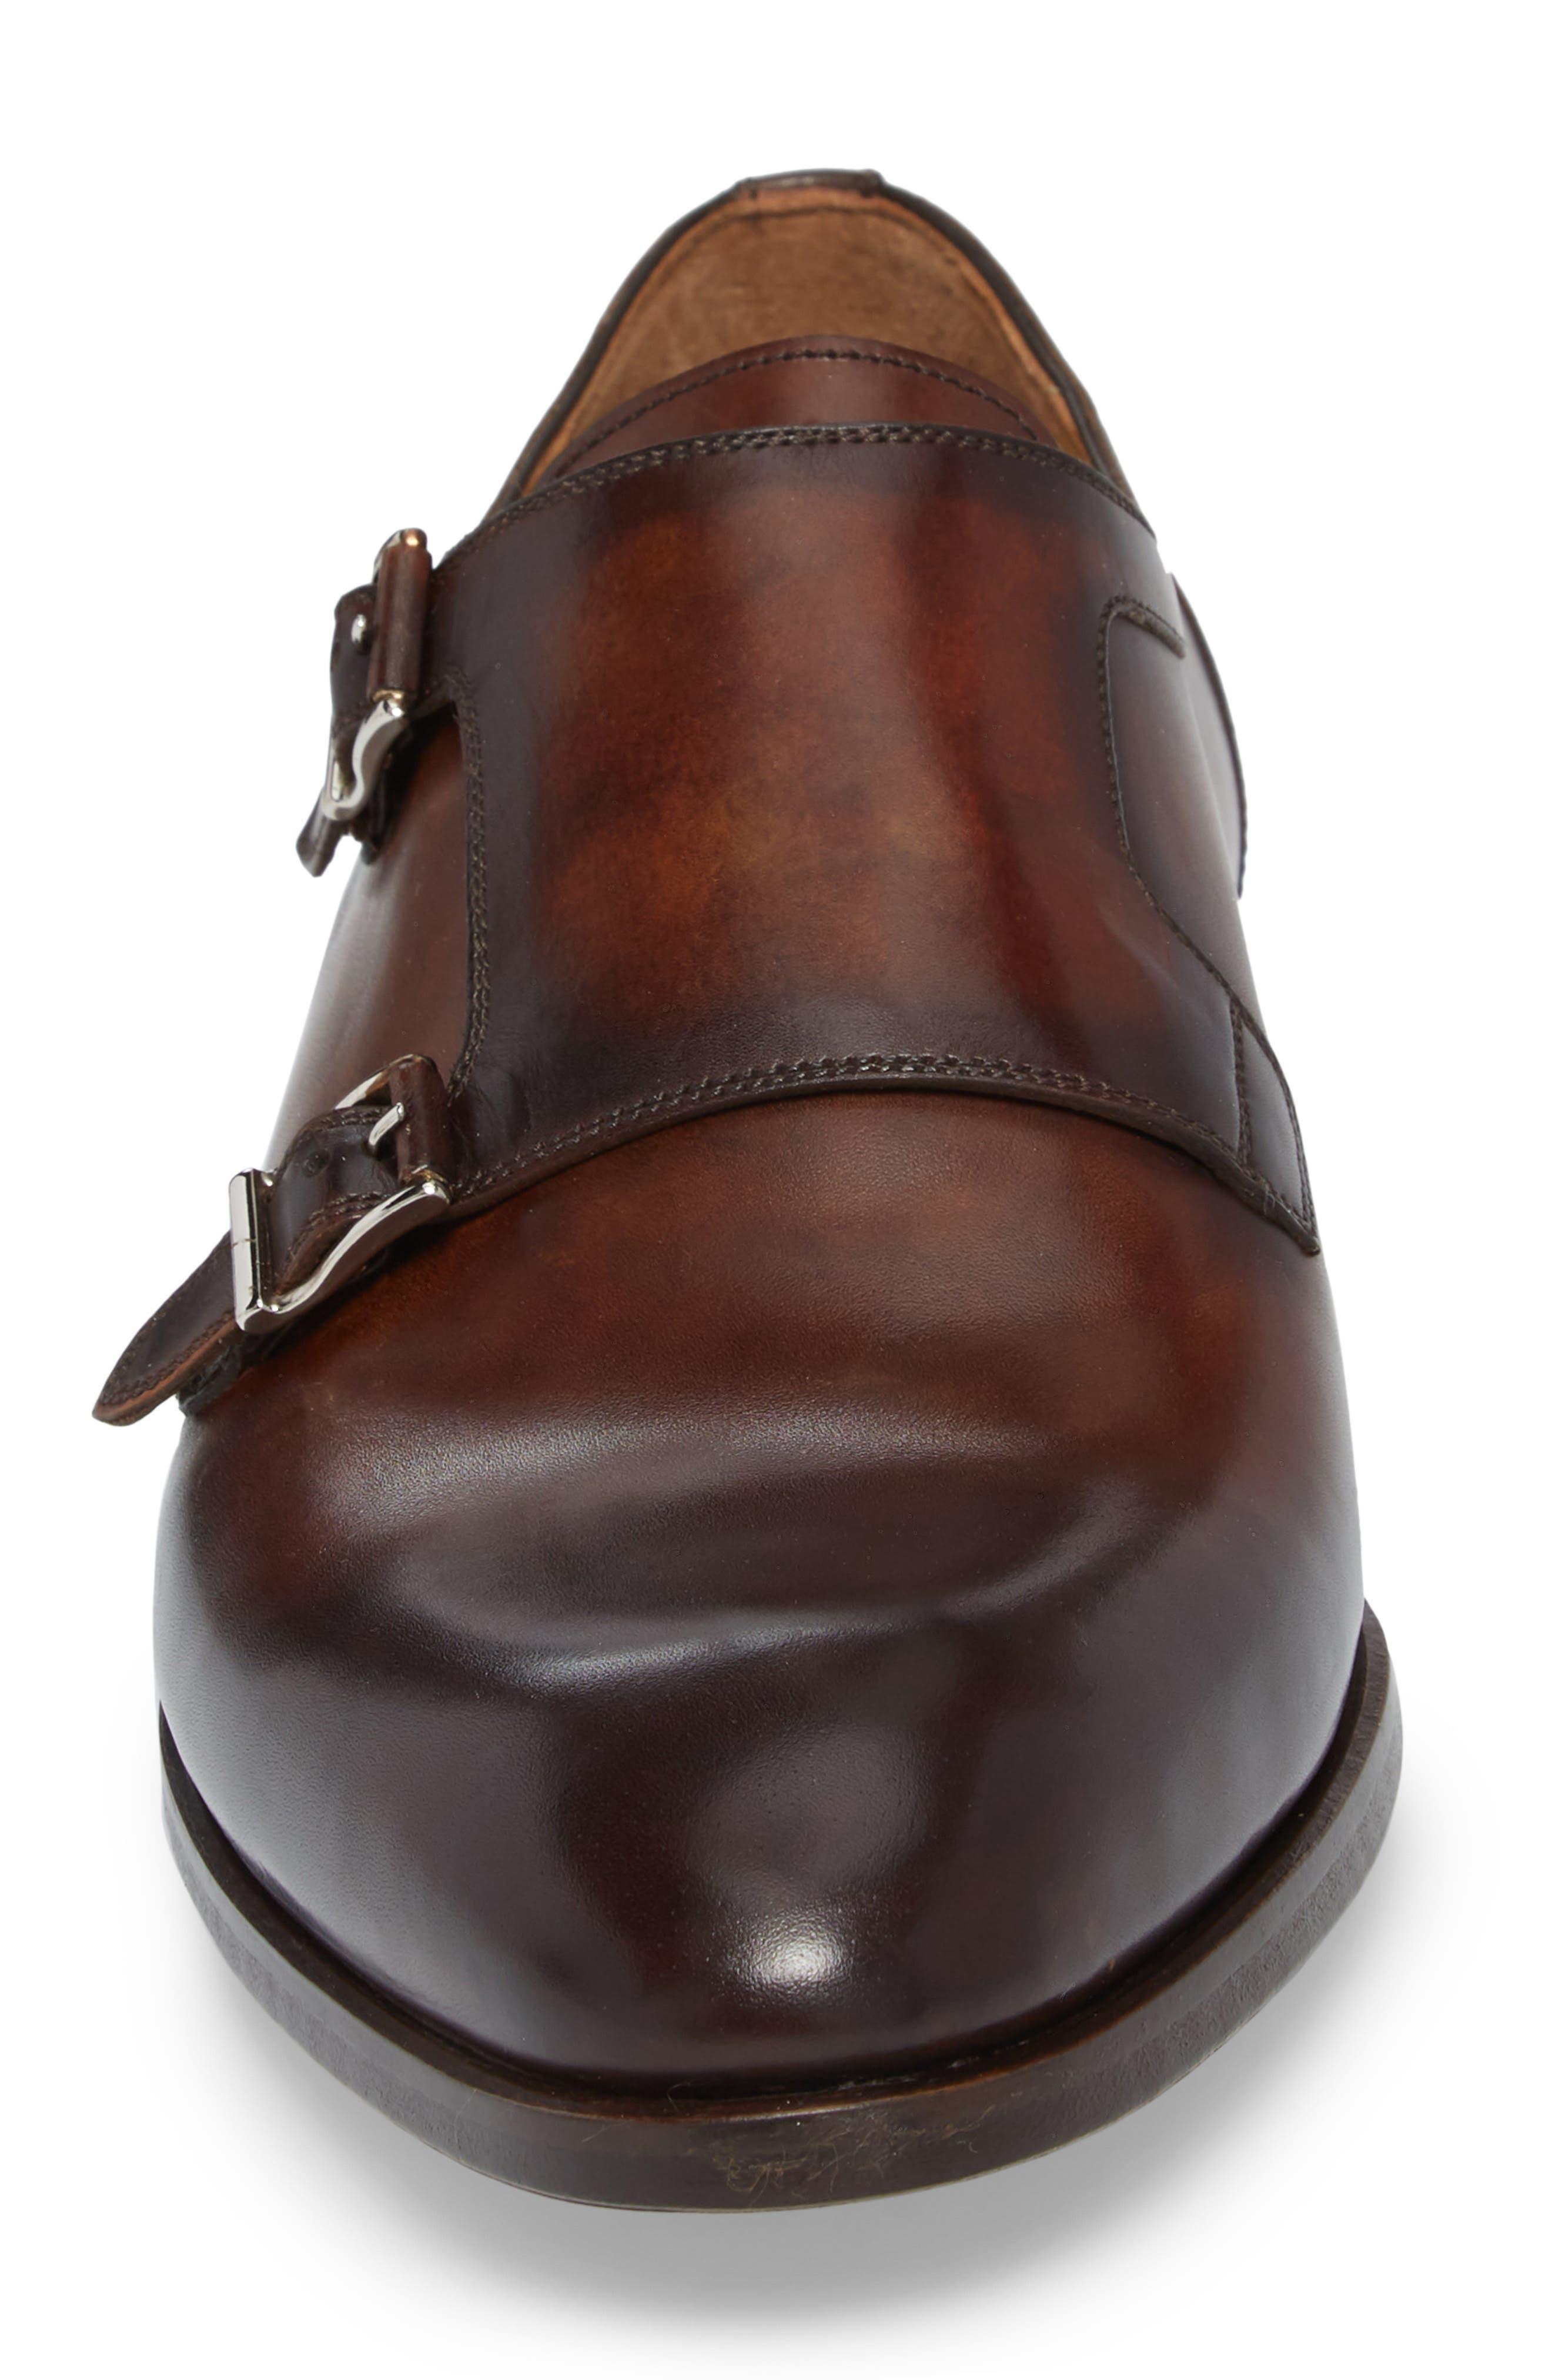 Pratt Double Strap Monk Shoe,                             Alternate thumbnail 4, color,                             Tabaco Leather